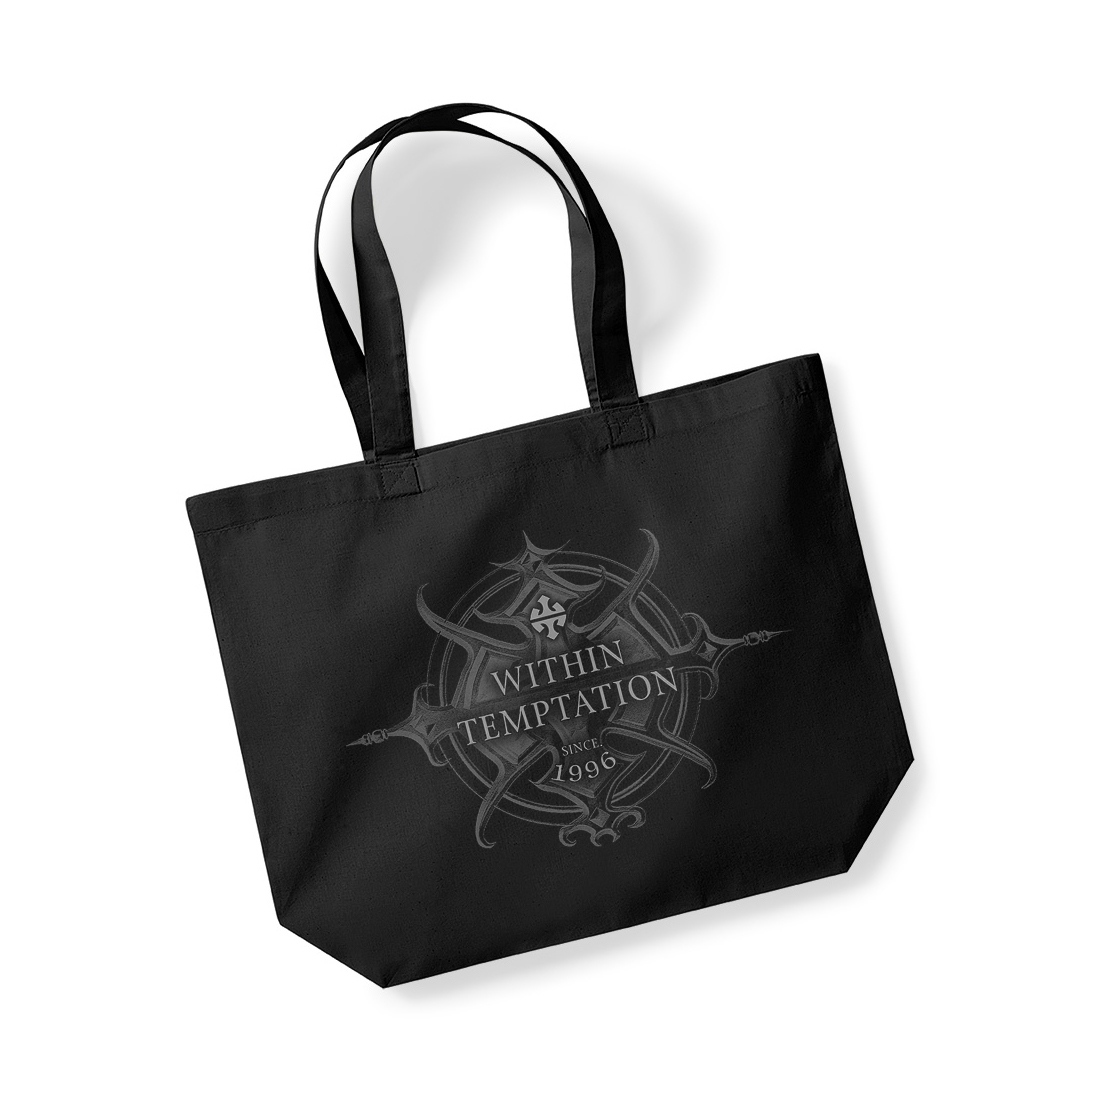 Since 96 - Shopper Bag - Within Temptation